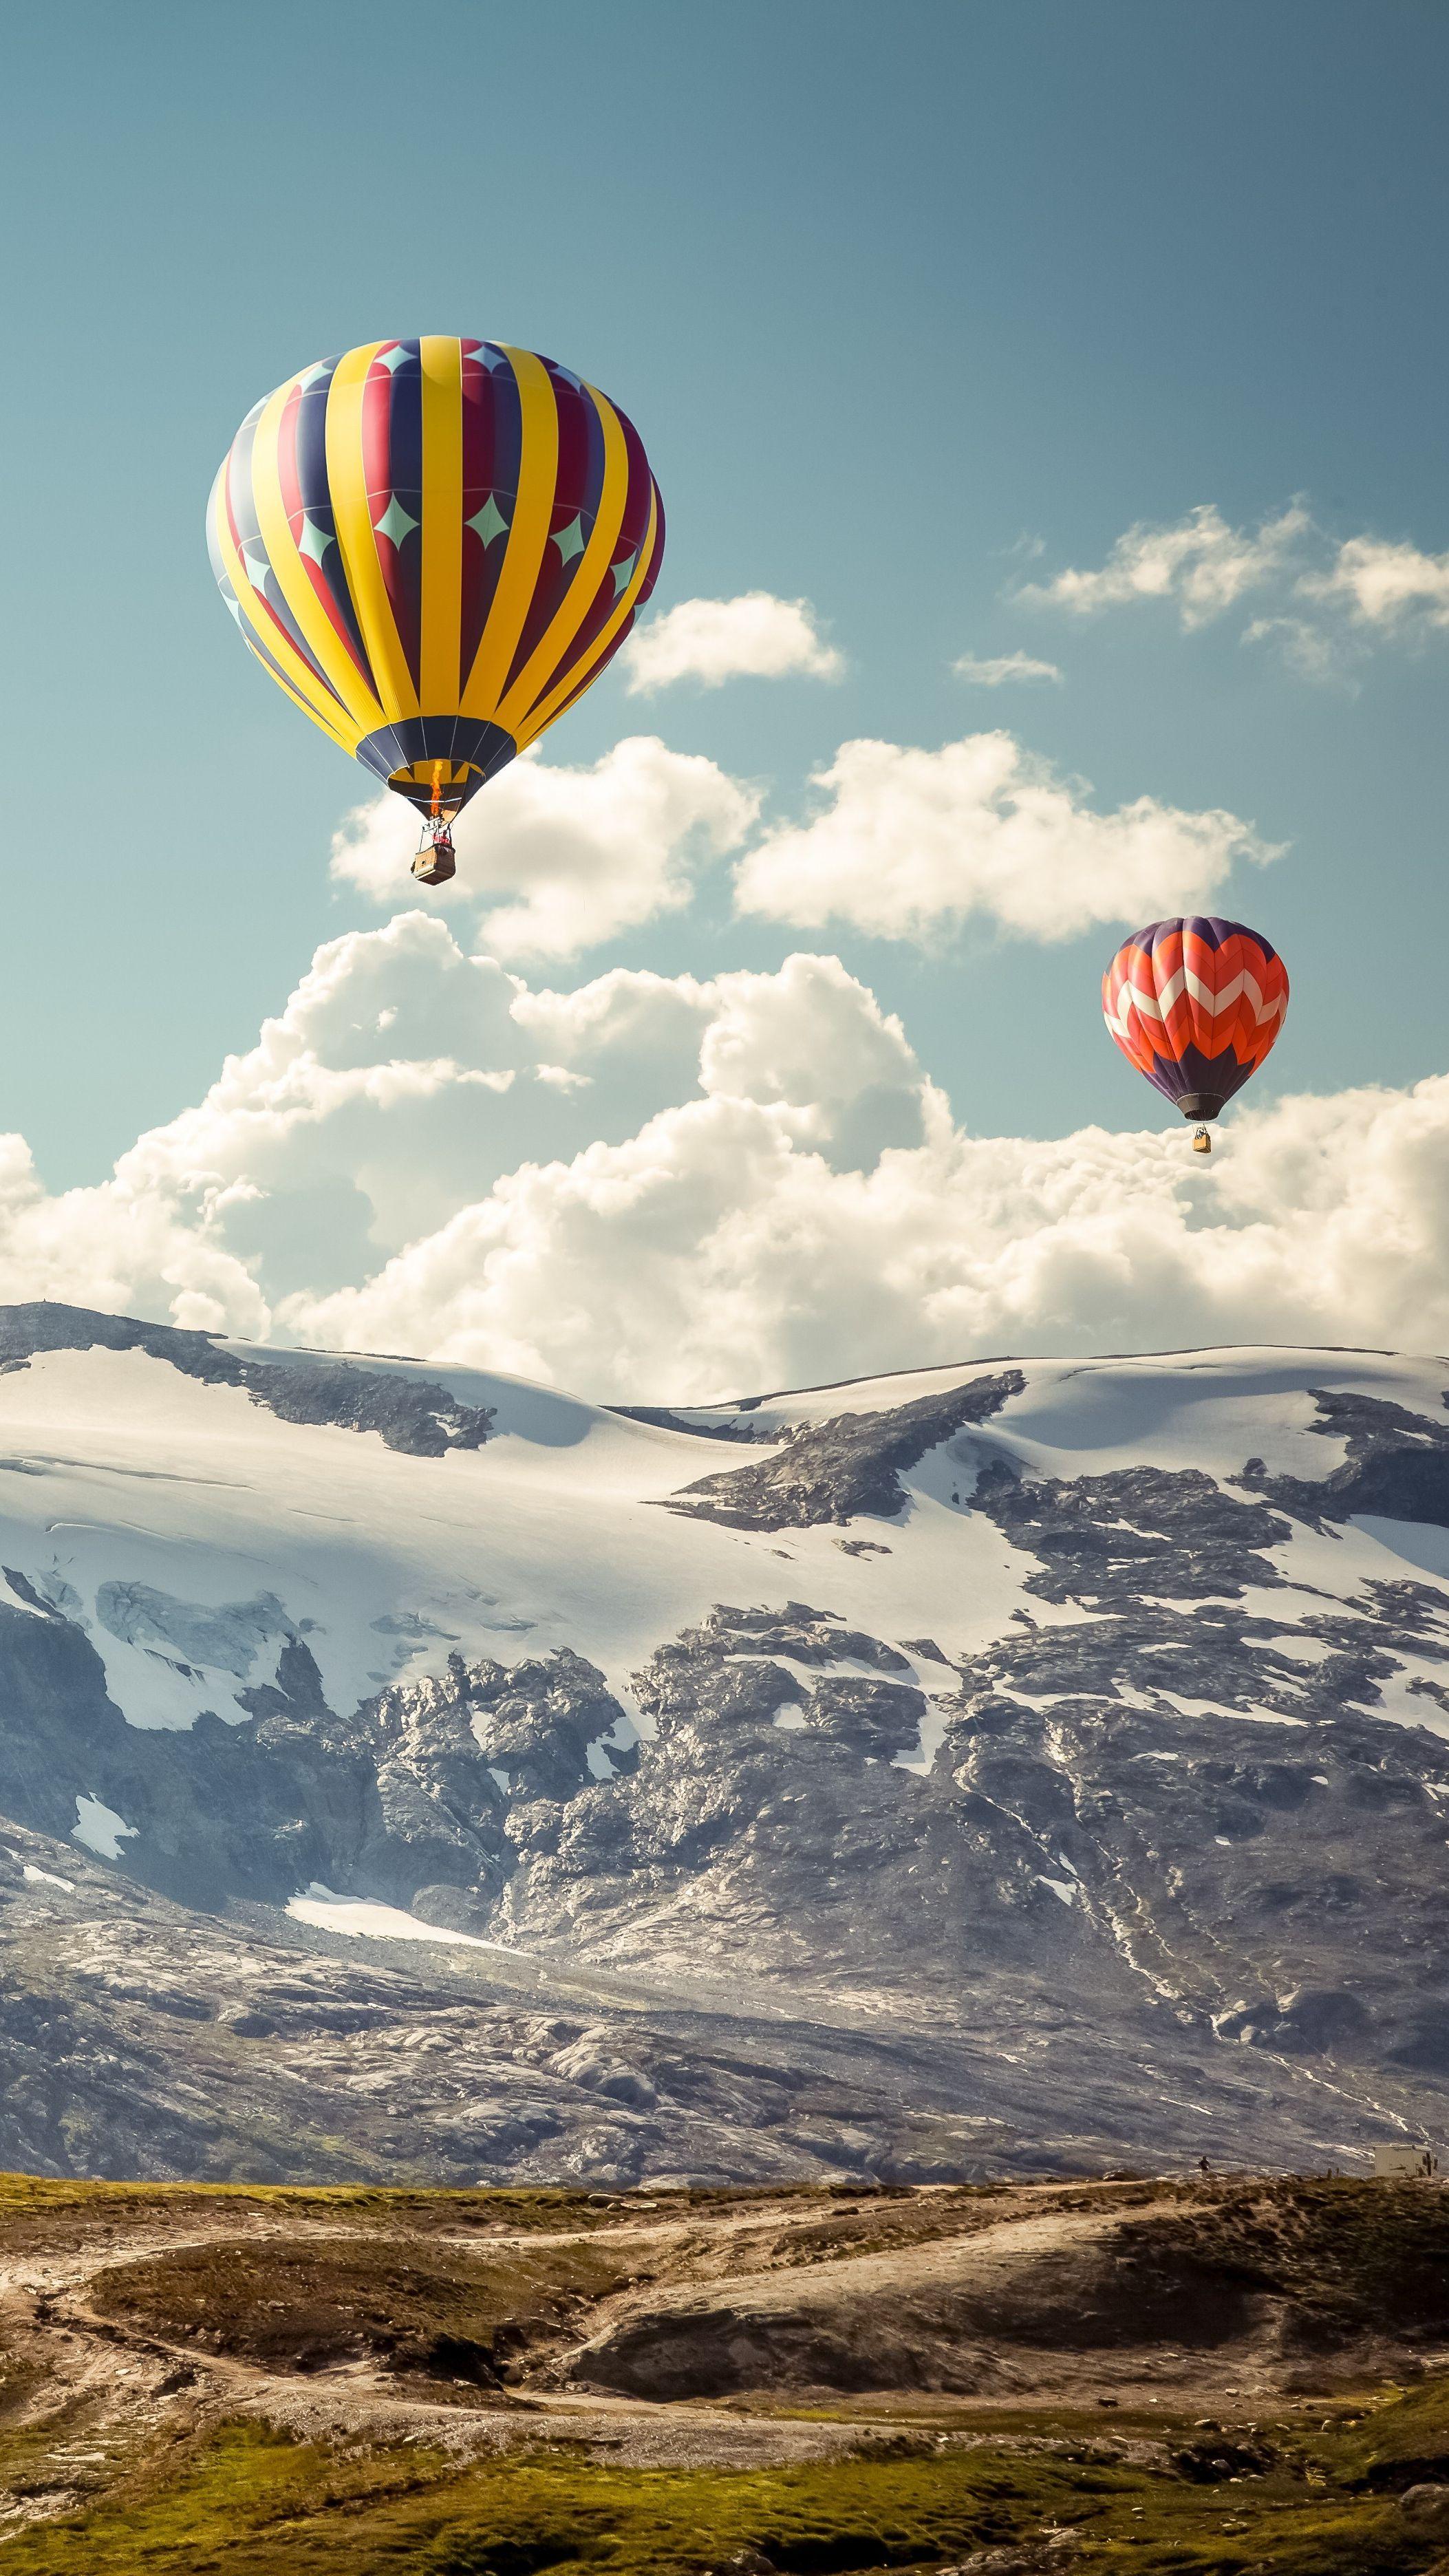 Hot Air Balloon Nature Iphone Xs Max Wallpapers Wallpaper Cave